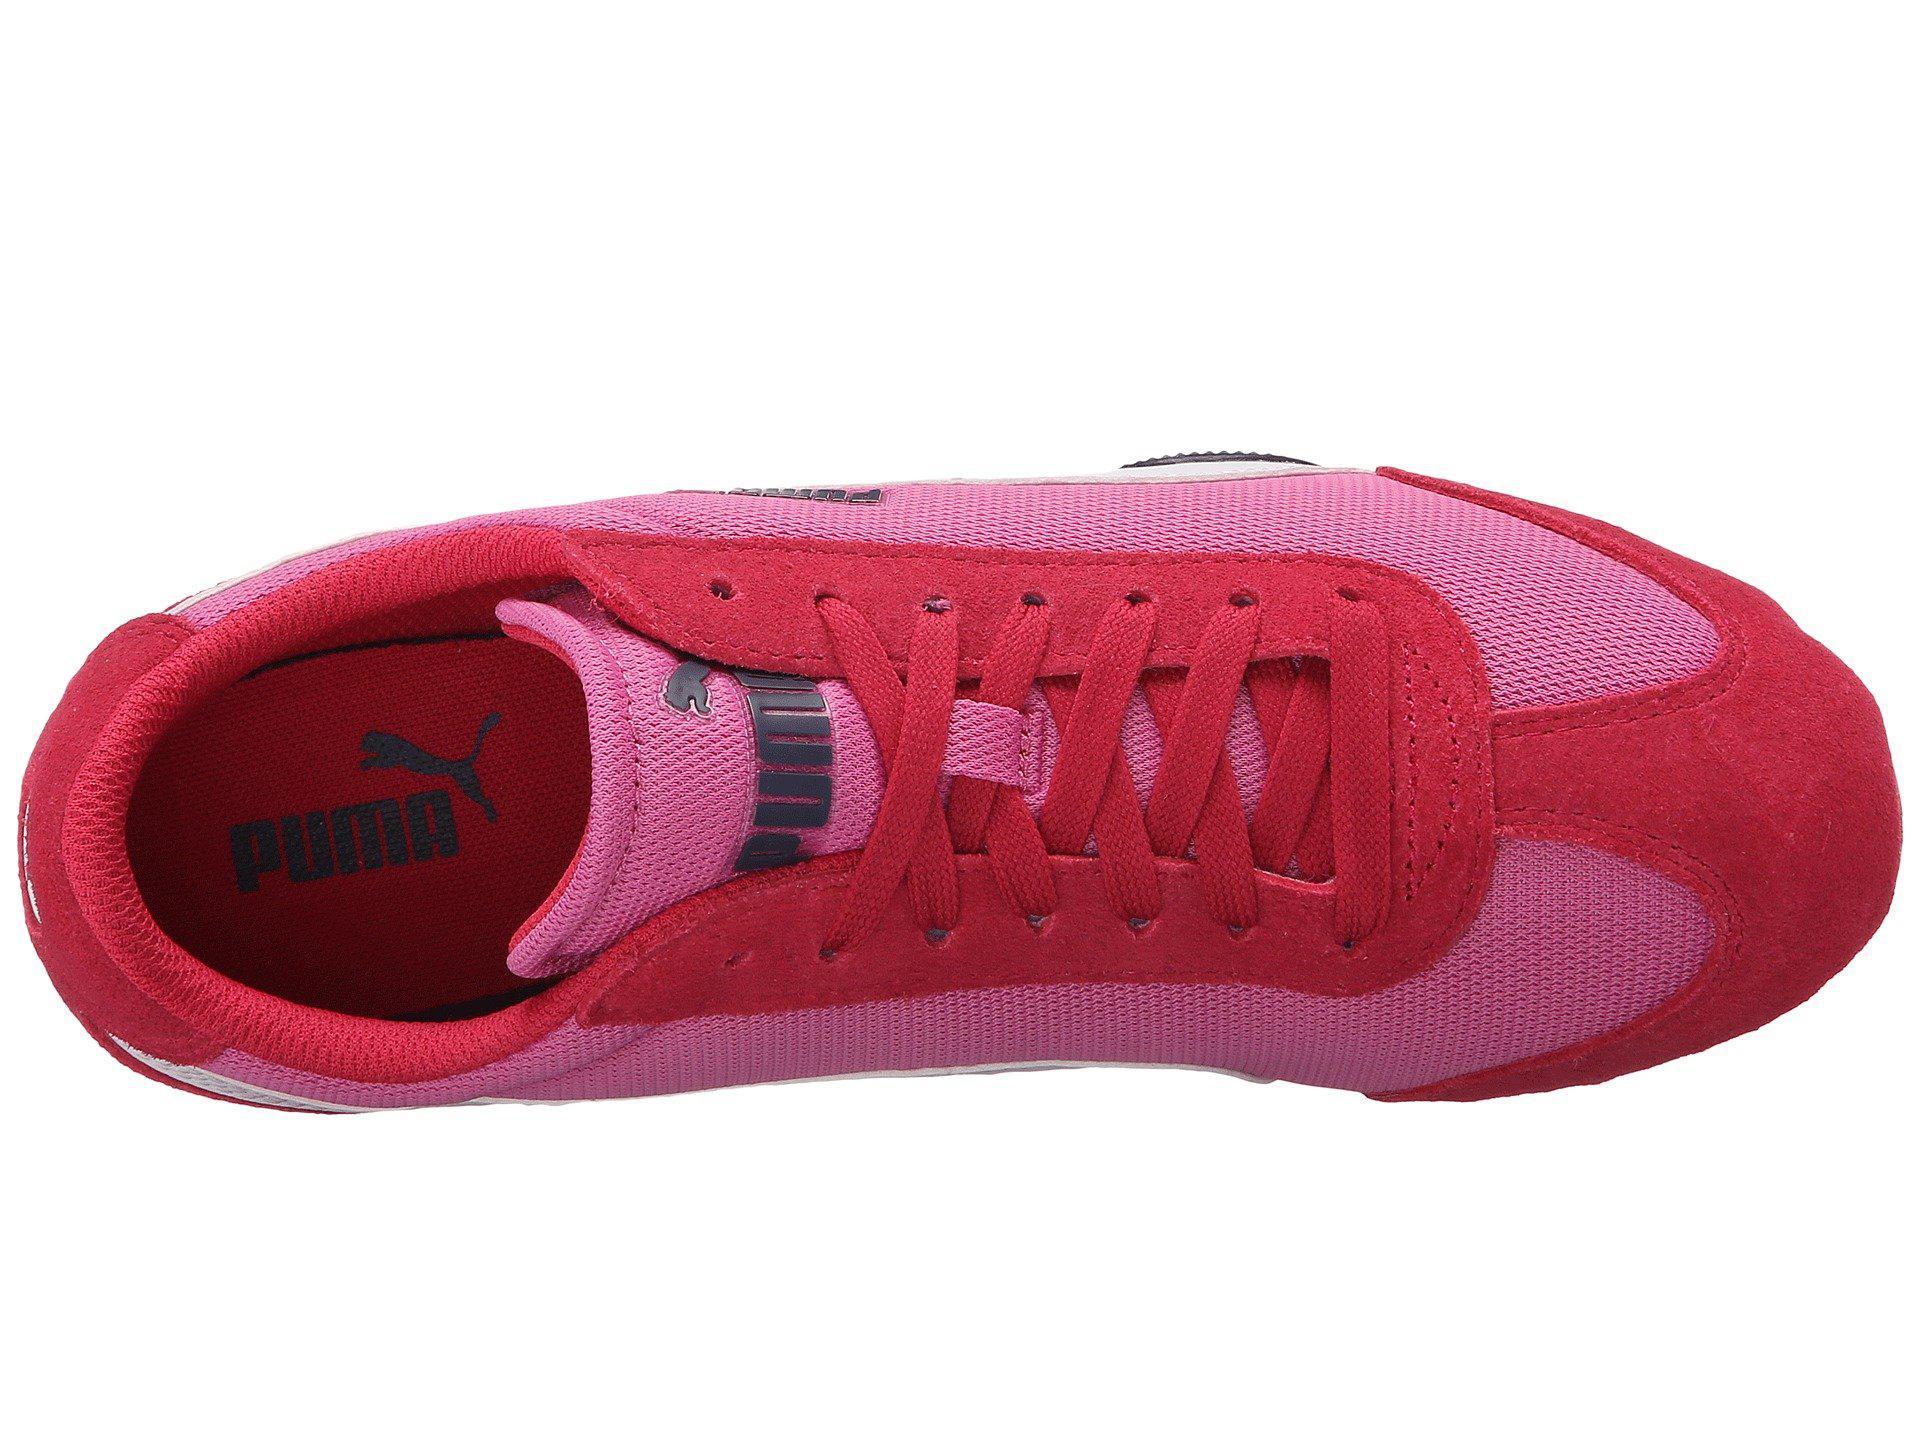 b65302611a9 Lyst - PUMA 76 Runner Fun Mesh in Pink